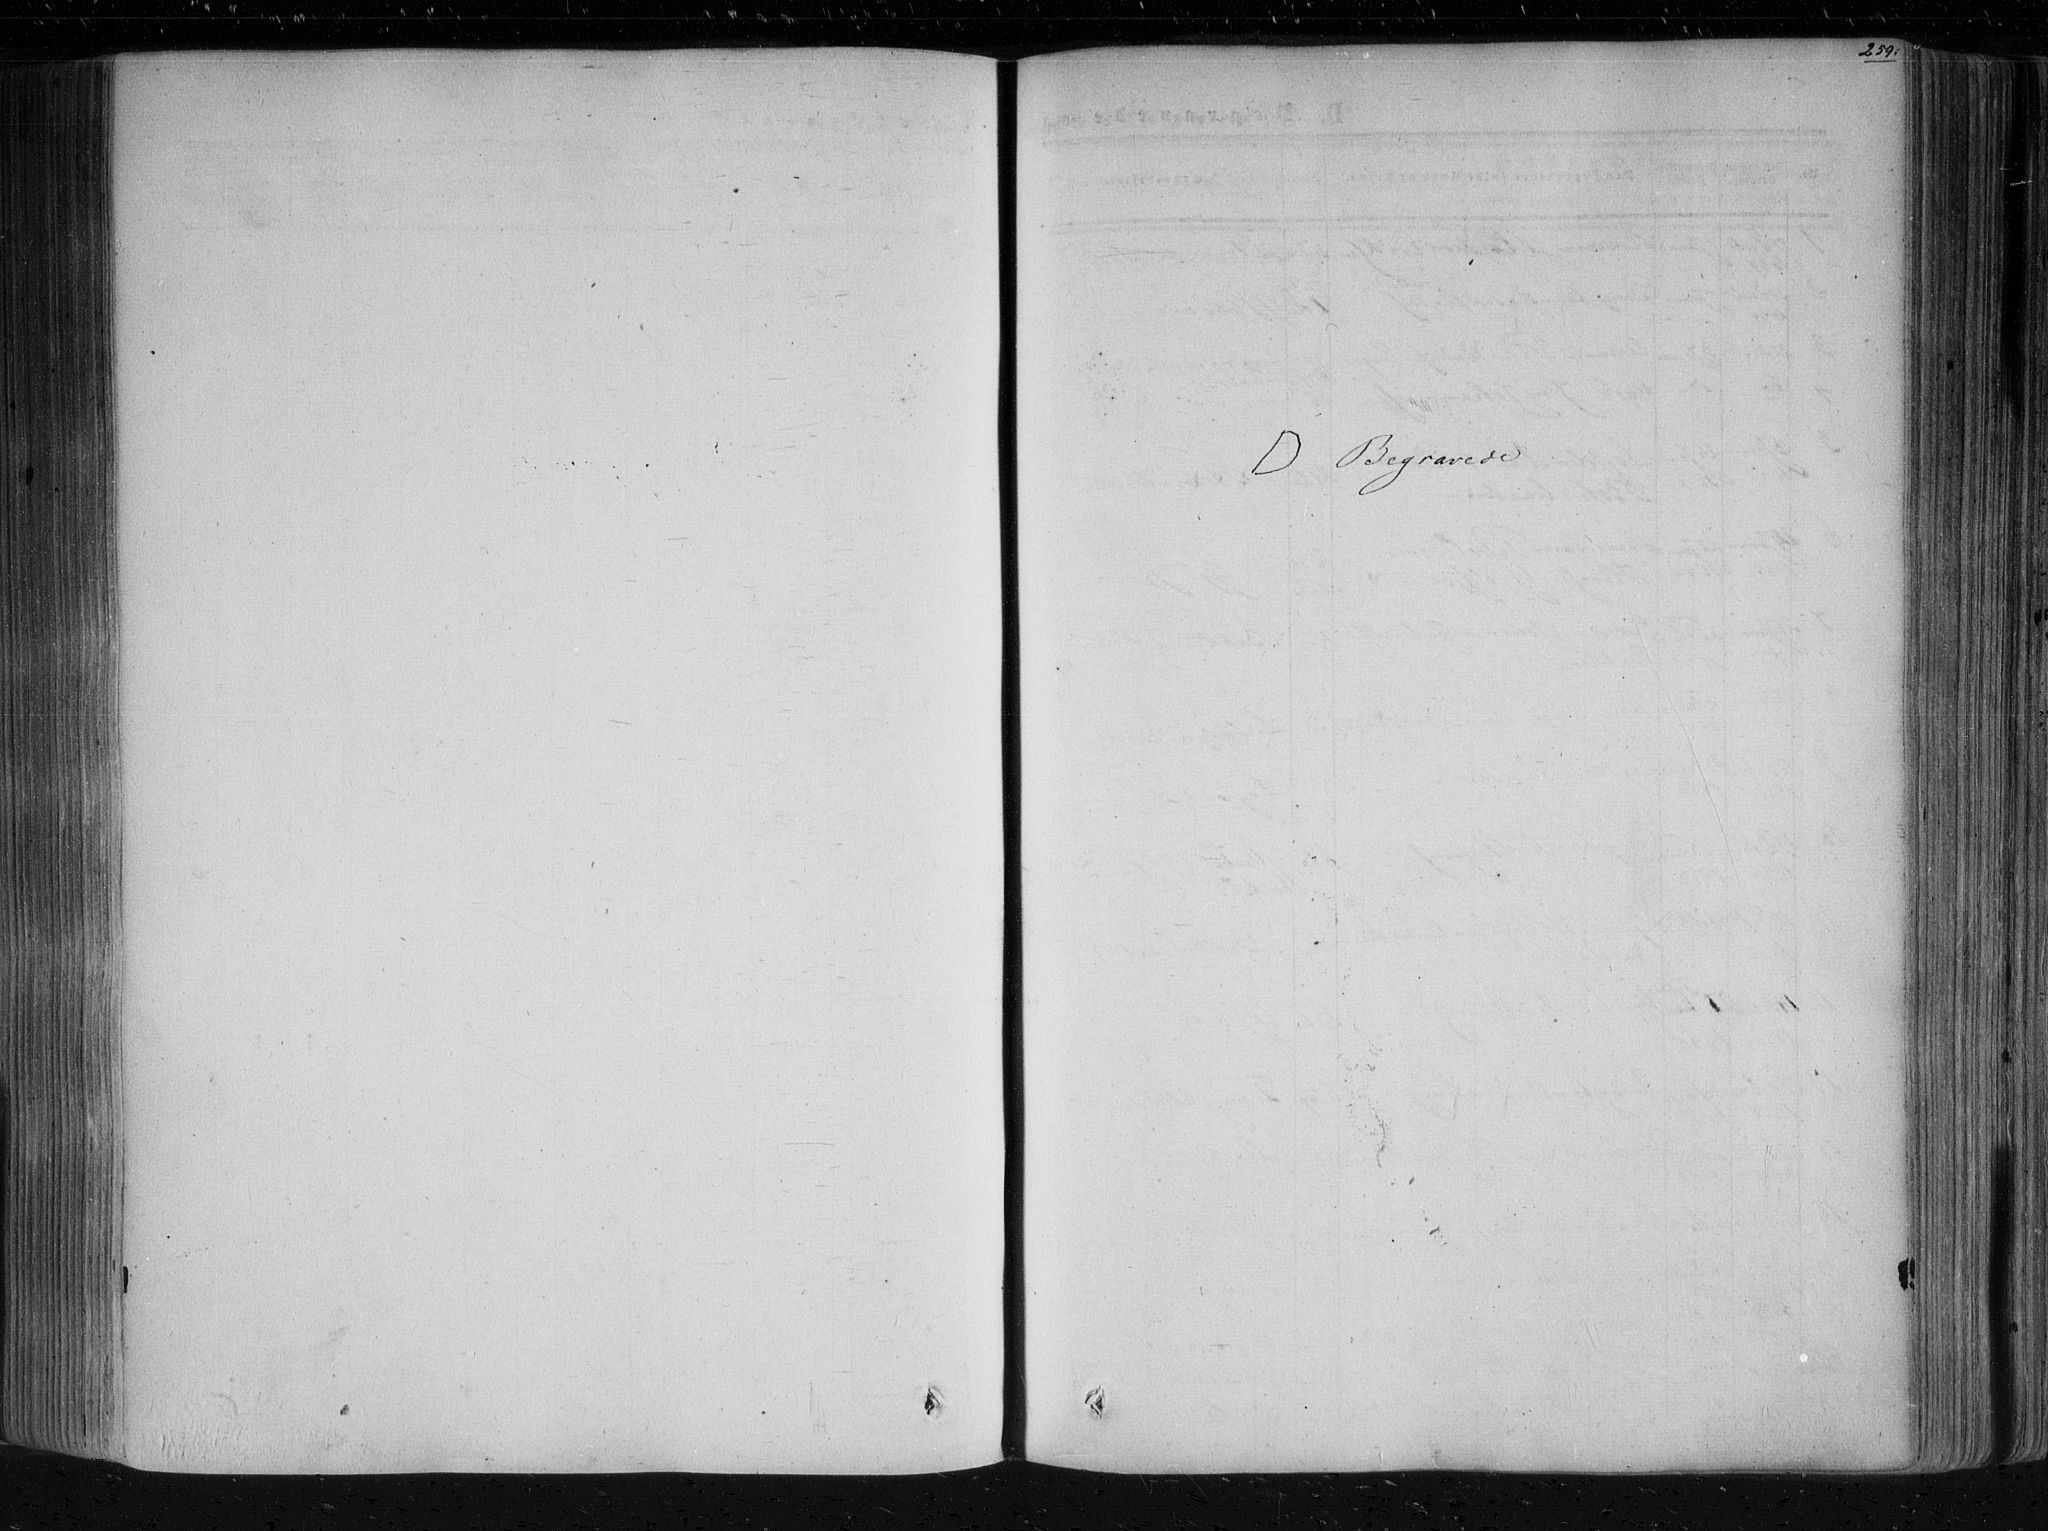 SAO, Aremark prestekontor Kirkebøker, F/Fc/L0003: Ministerialbok nr. III 3, 1850-1865, s. 259